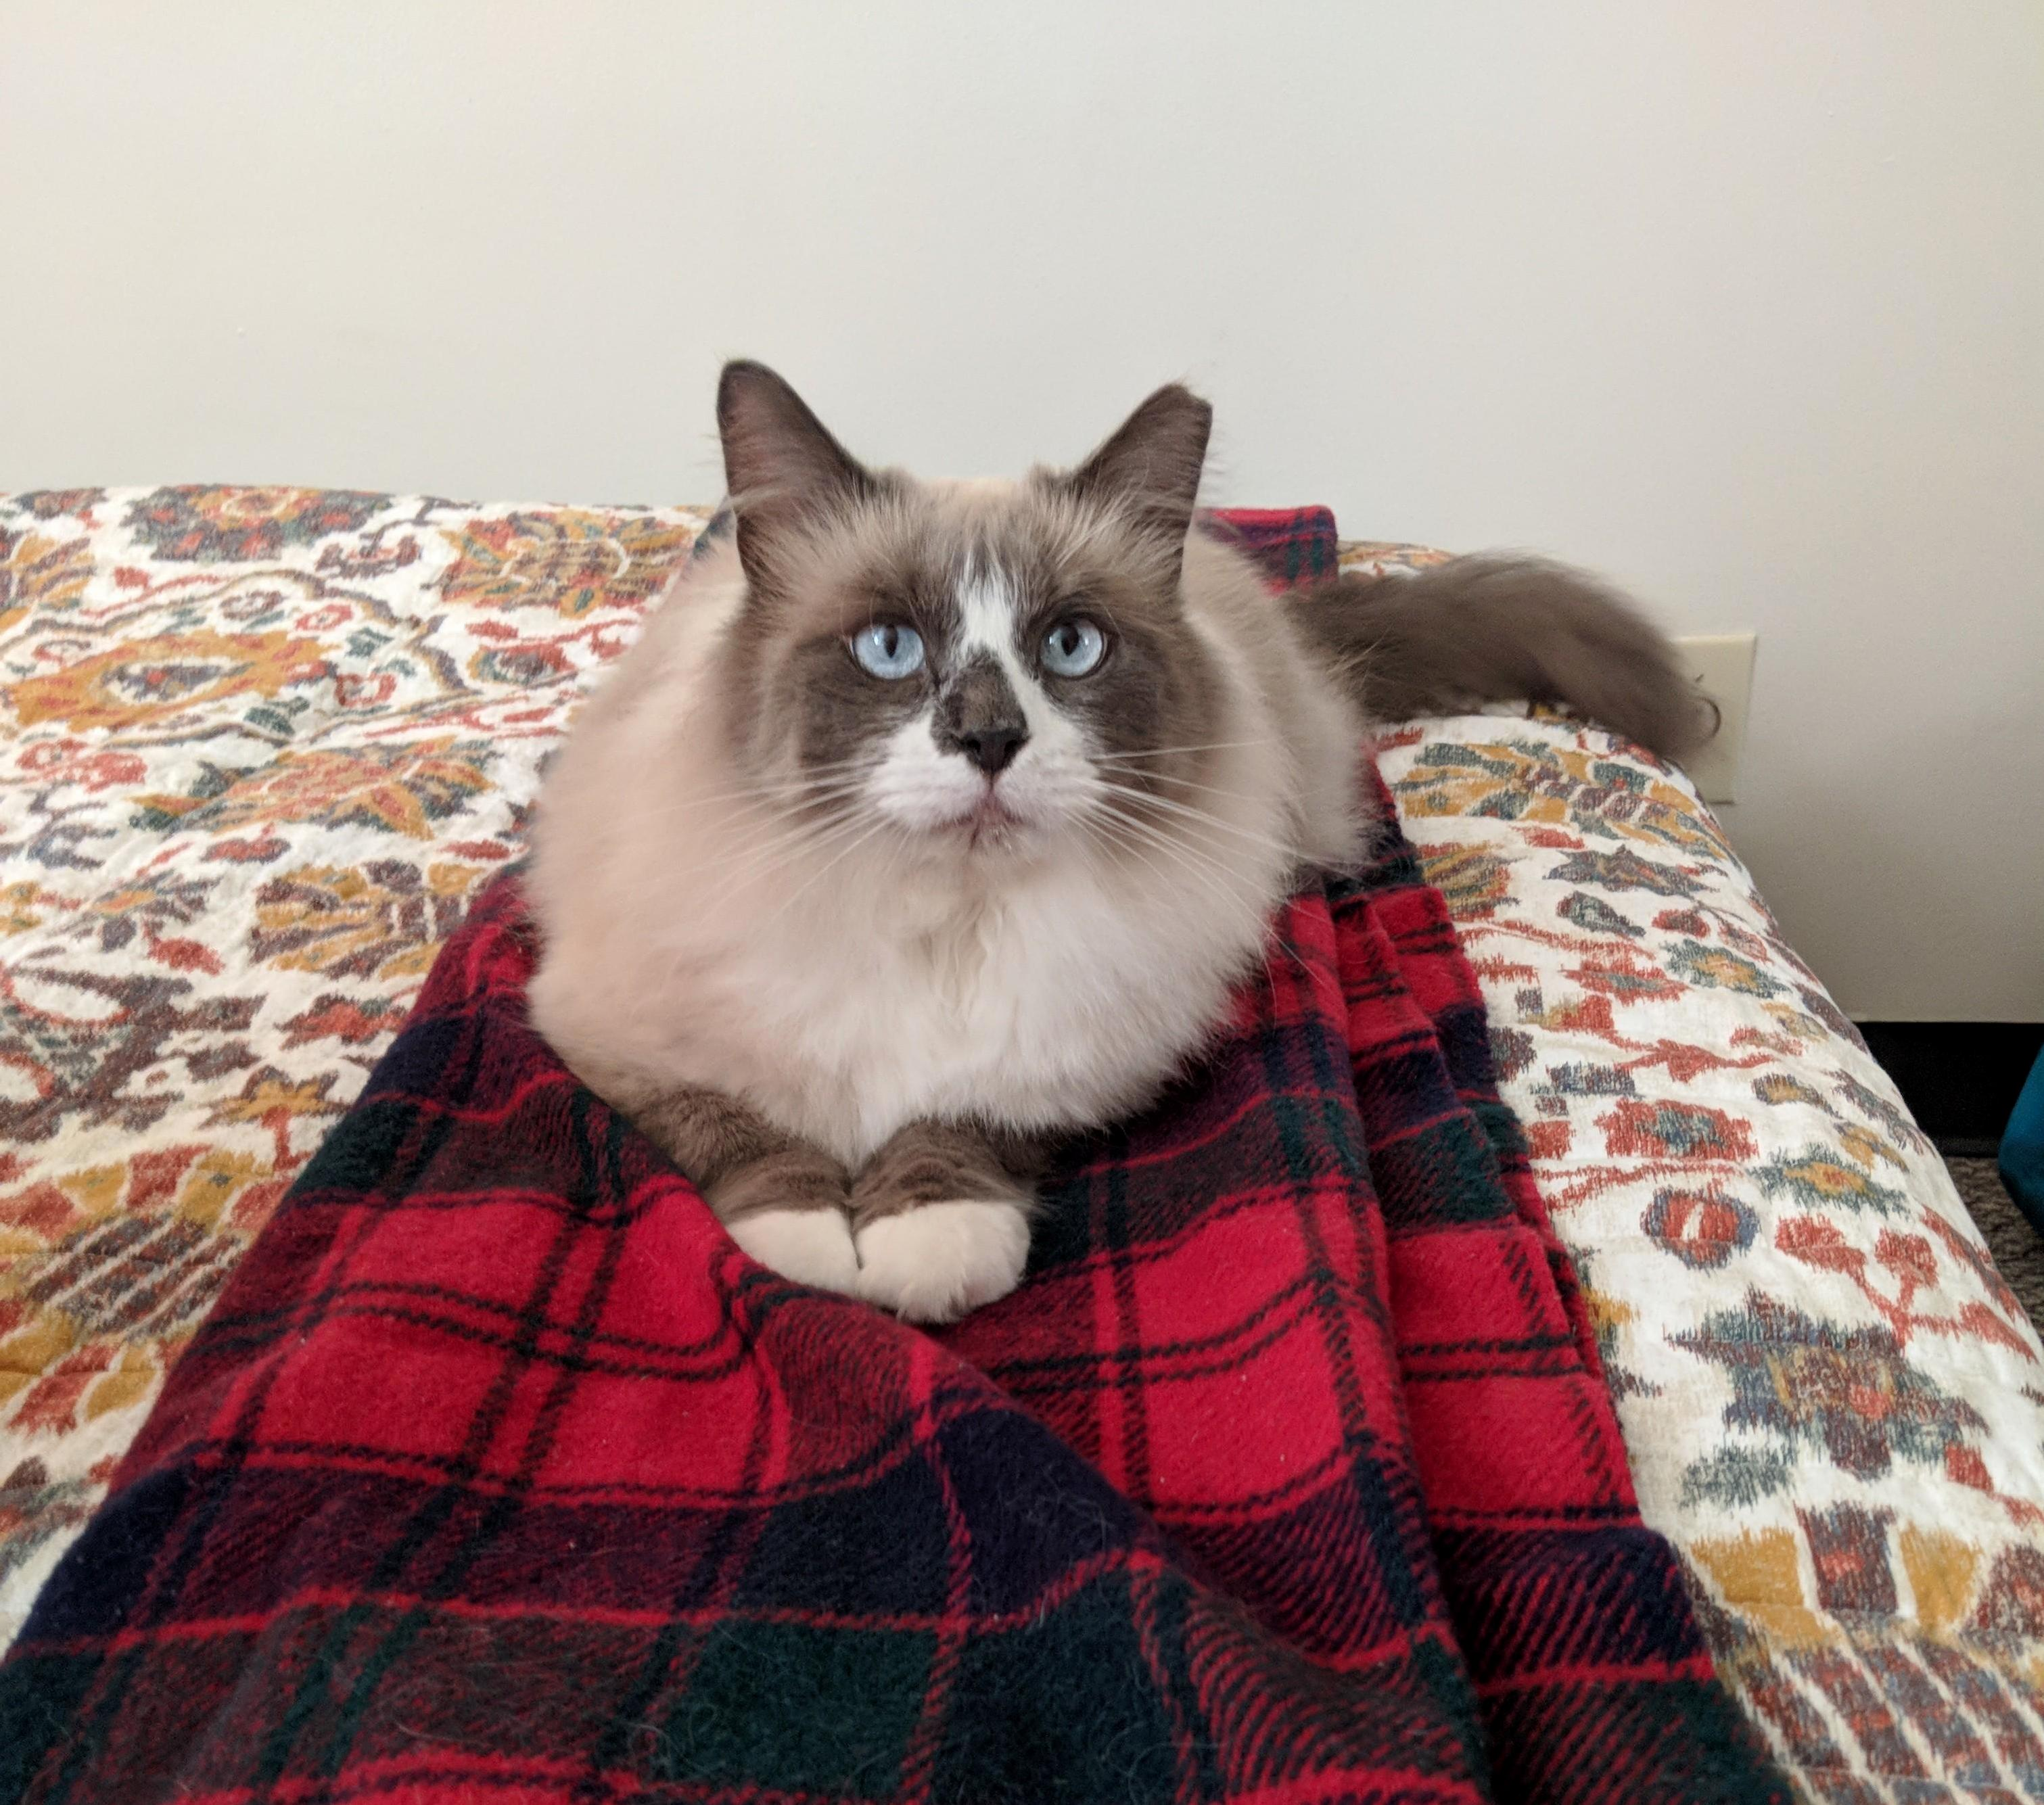 My prince on his favorite blanket